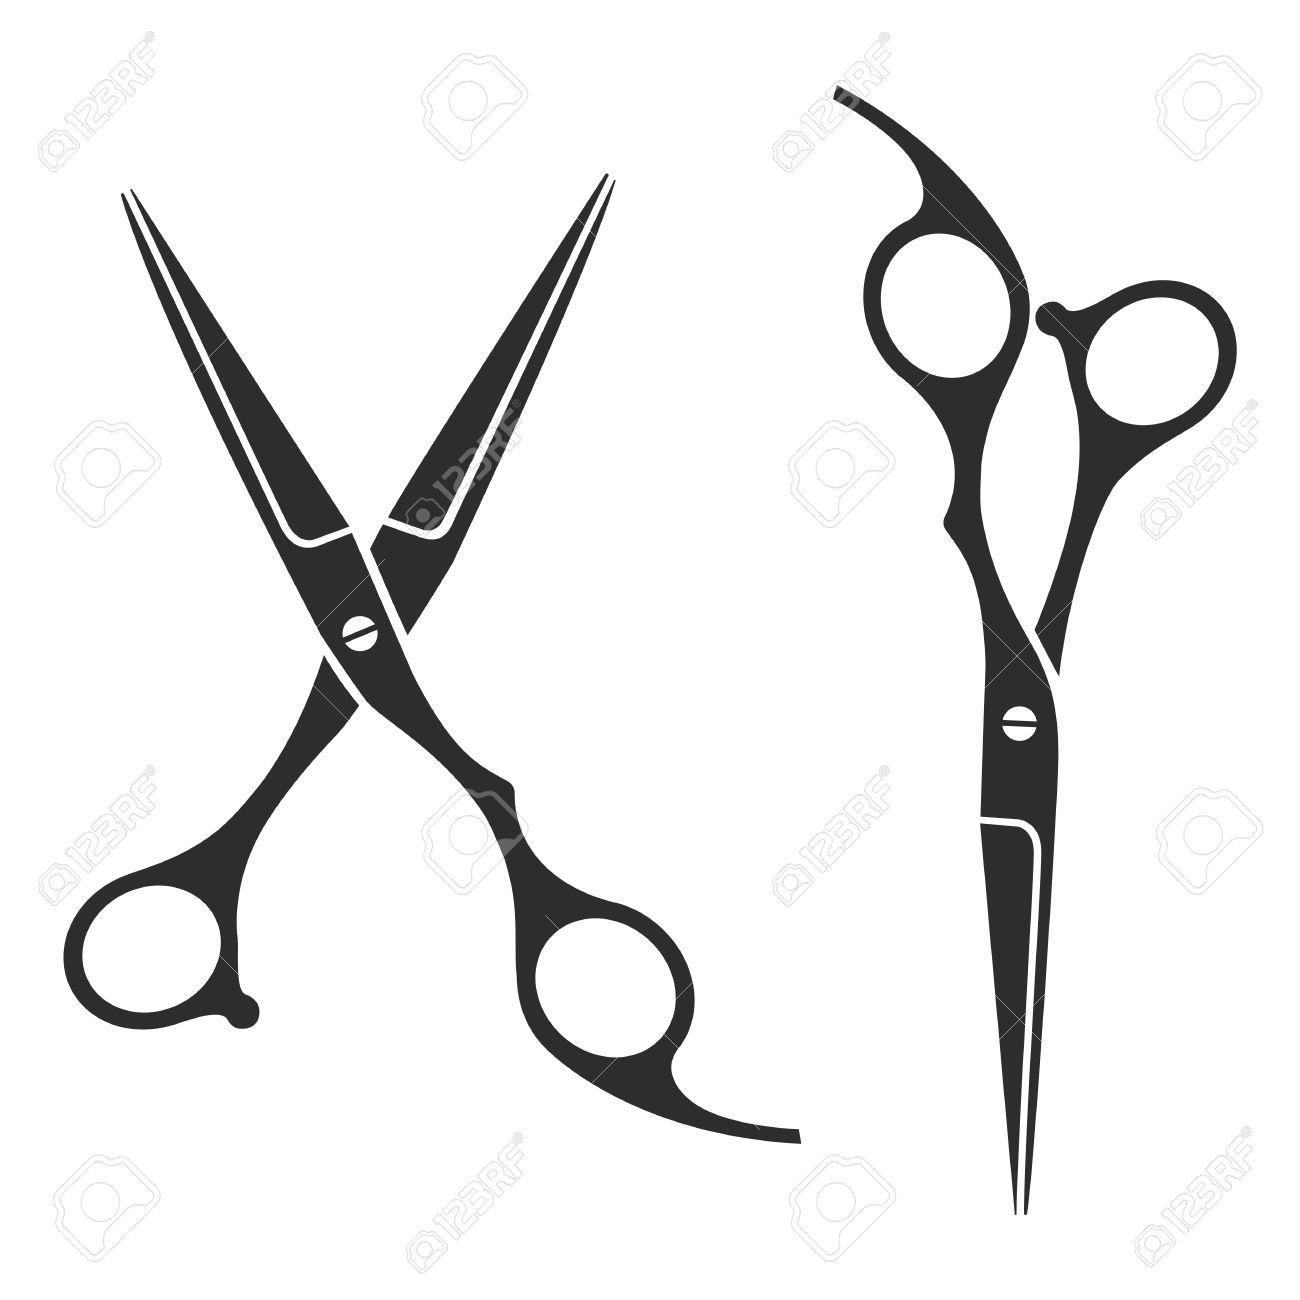 37044062 Vintage Barber Shop Scissors Logo Label Badge Stock Photo Jpg 1300 1300 Hairdresser Tattoos Scissors Tattoo Barber Tattoo